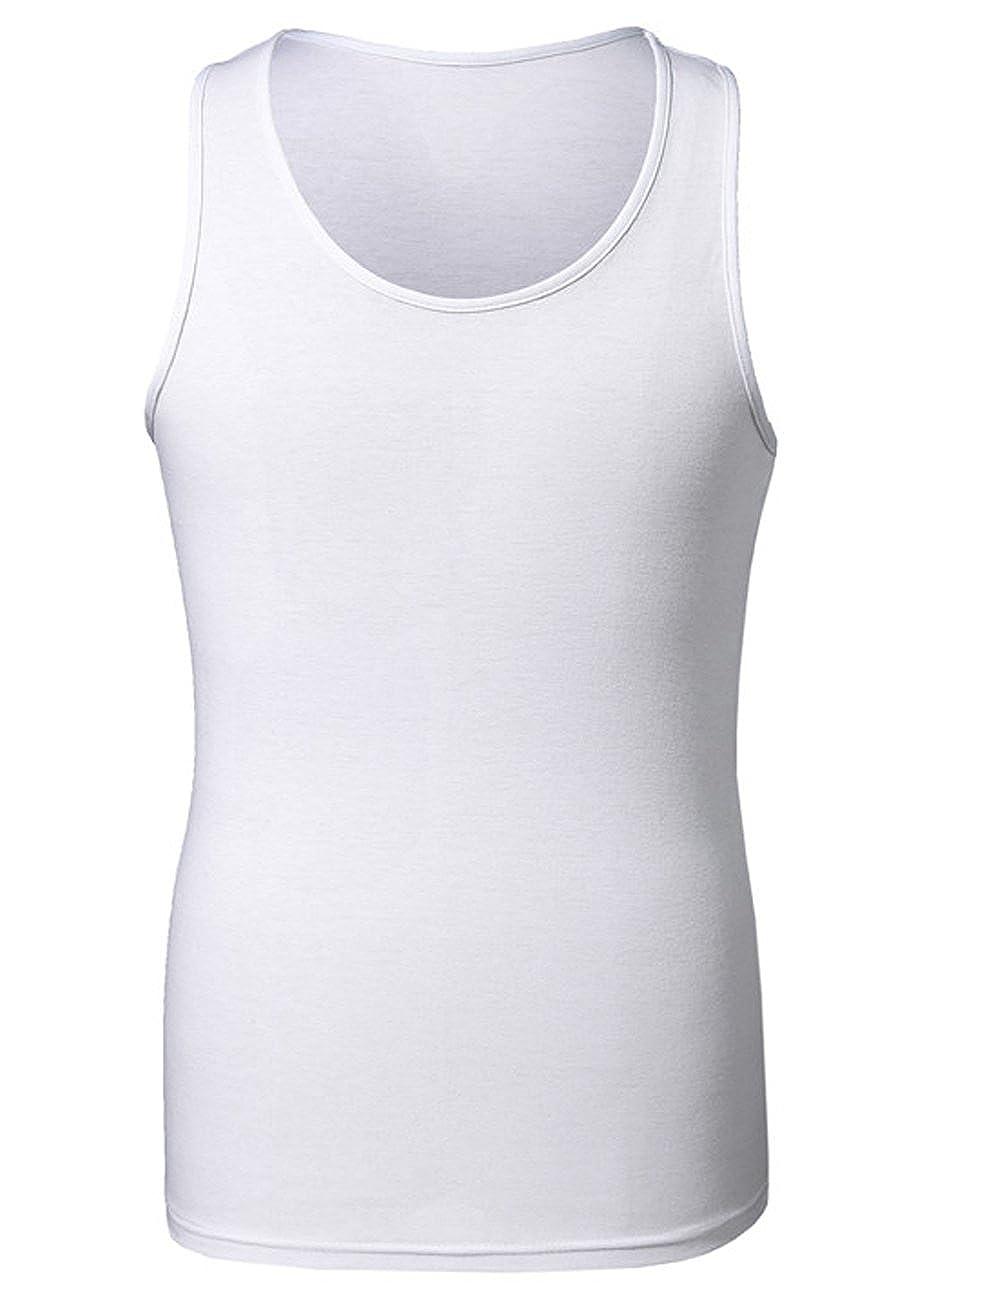 Ainiel Mens Boys Hoodie Sweatshirt Long Sleeve Full Zip Light Weight Red White